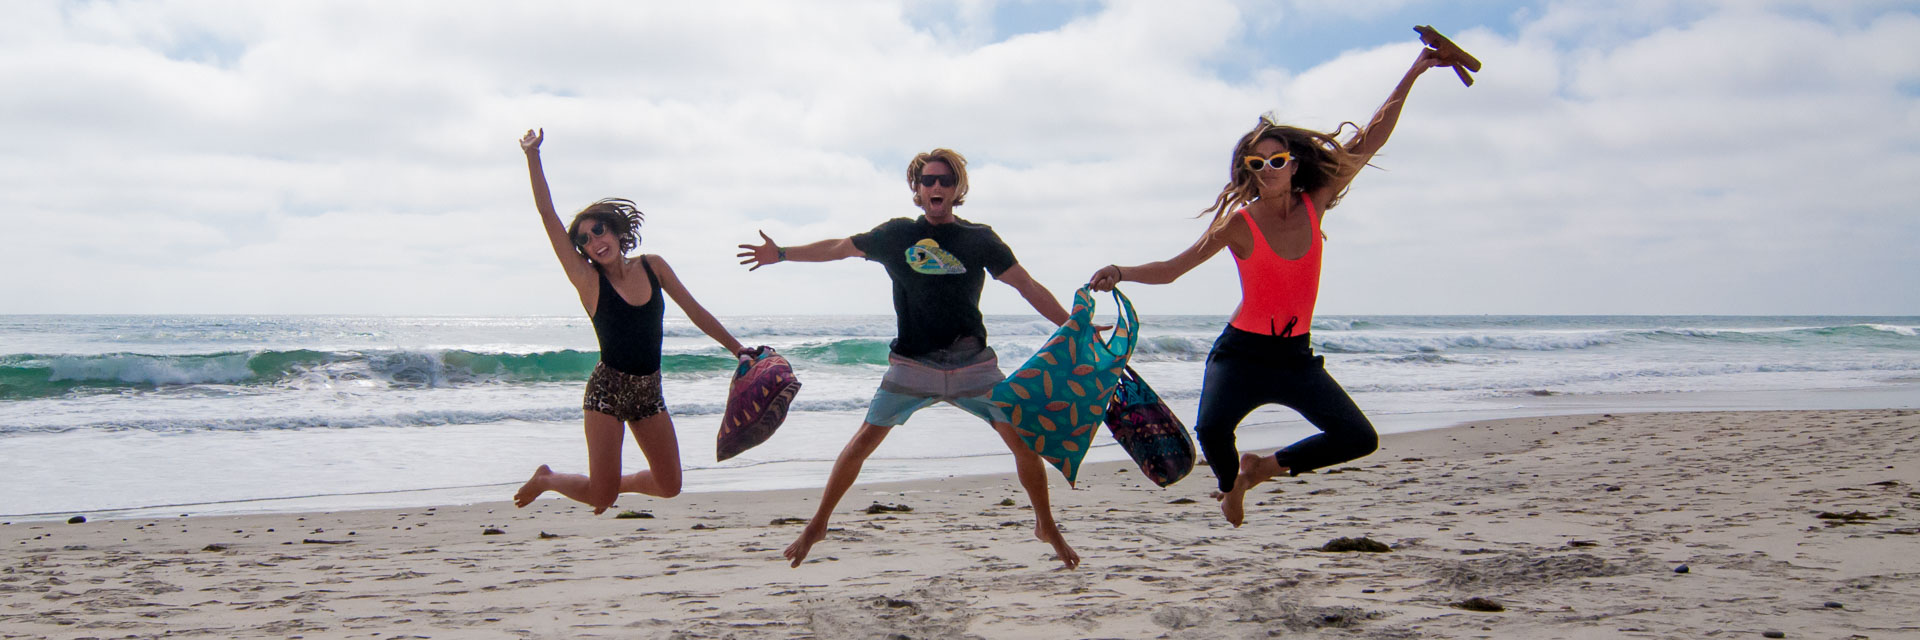 CrapChute Bags - Kickstarter Launch